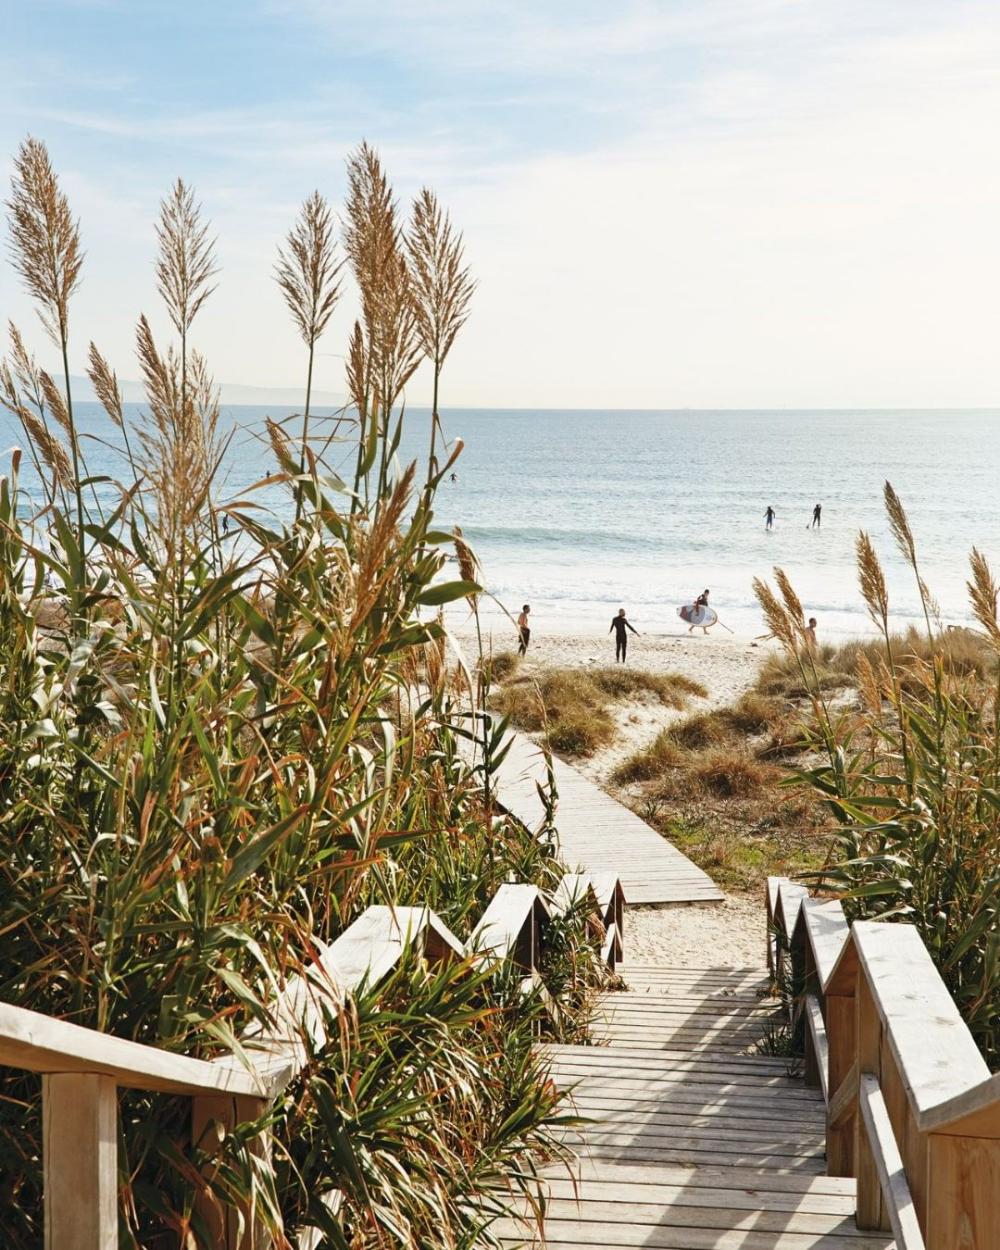 Travel Landscape Sea Beach Spain Via Instagram Beautiful Destinations Travel Inspiration Costa De La Luz